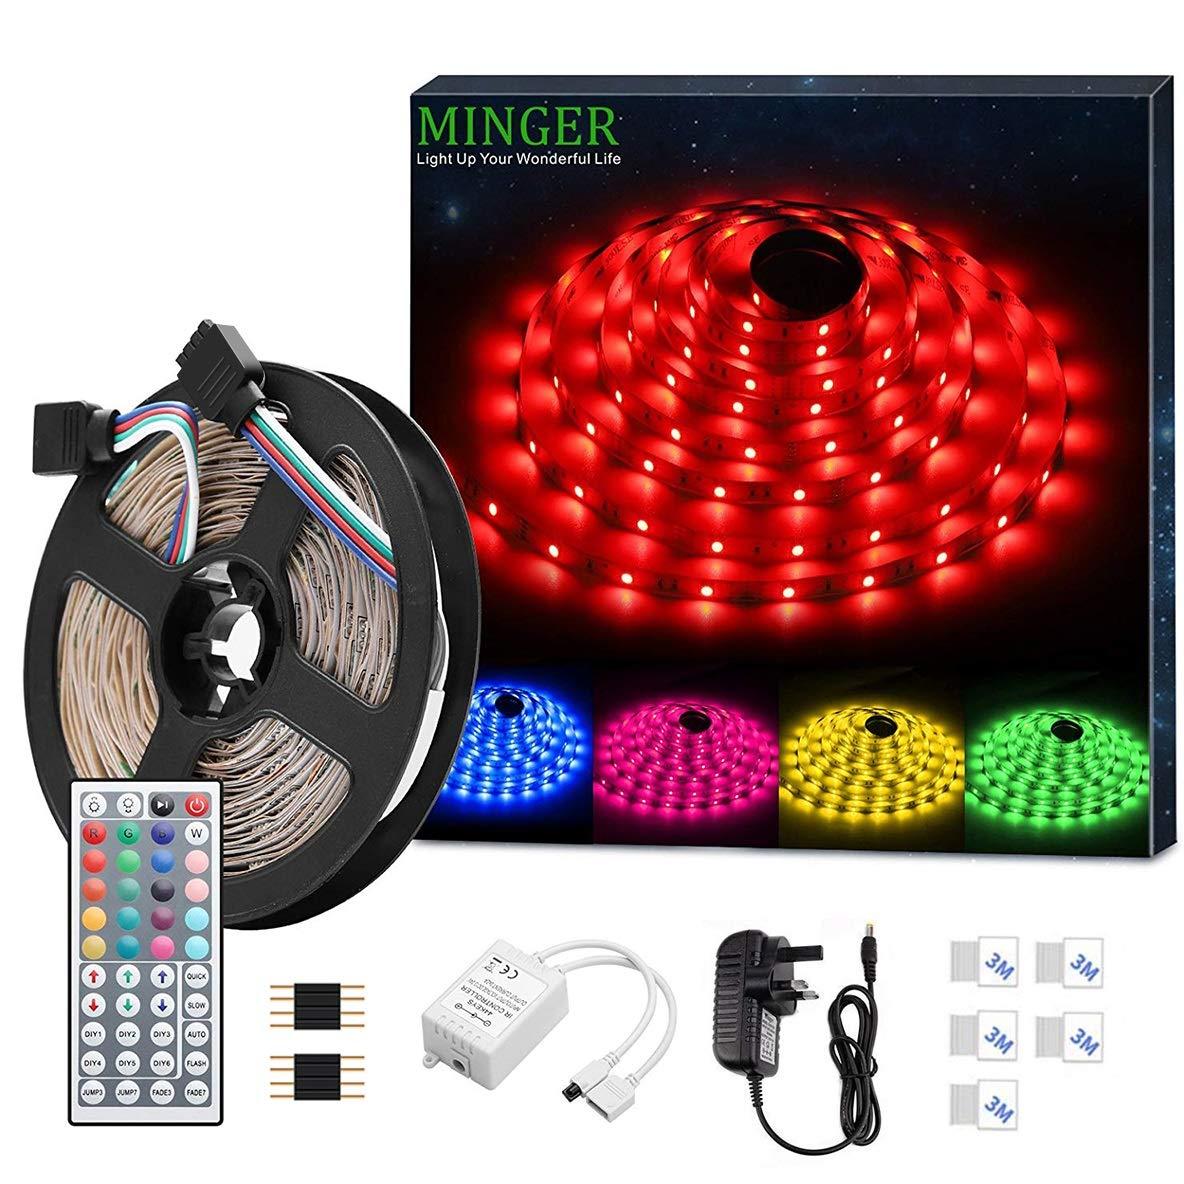 ae1f5c24dd93a6 LED Strip Light MINGER 16.4ft(5m) RGB SMD 5050 LED Rope Lighting Color  Changing Full Kit with 44-Keys IR Remote Controller LED Lighting Strips for  Kitchen ...